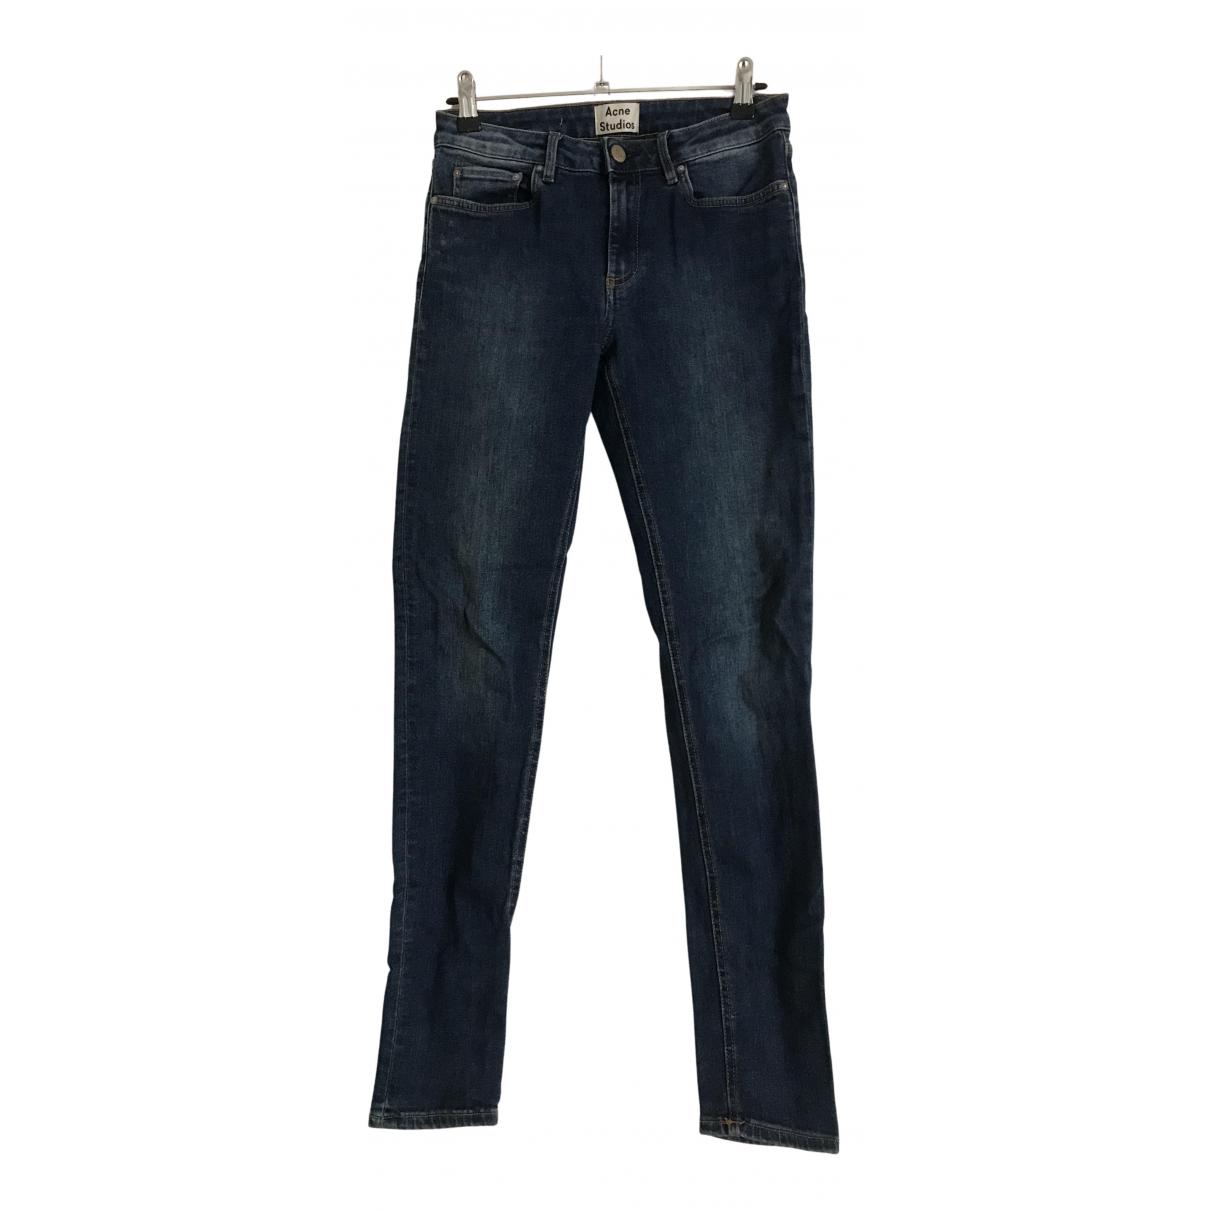 Acne Studios Skin 5 Blue Cotton Jeans for Women 27 US